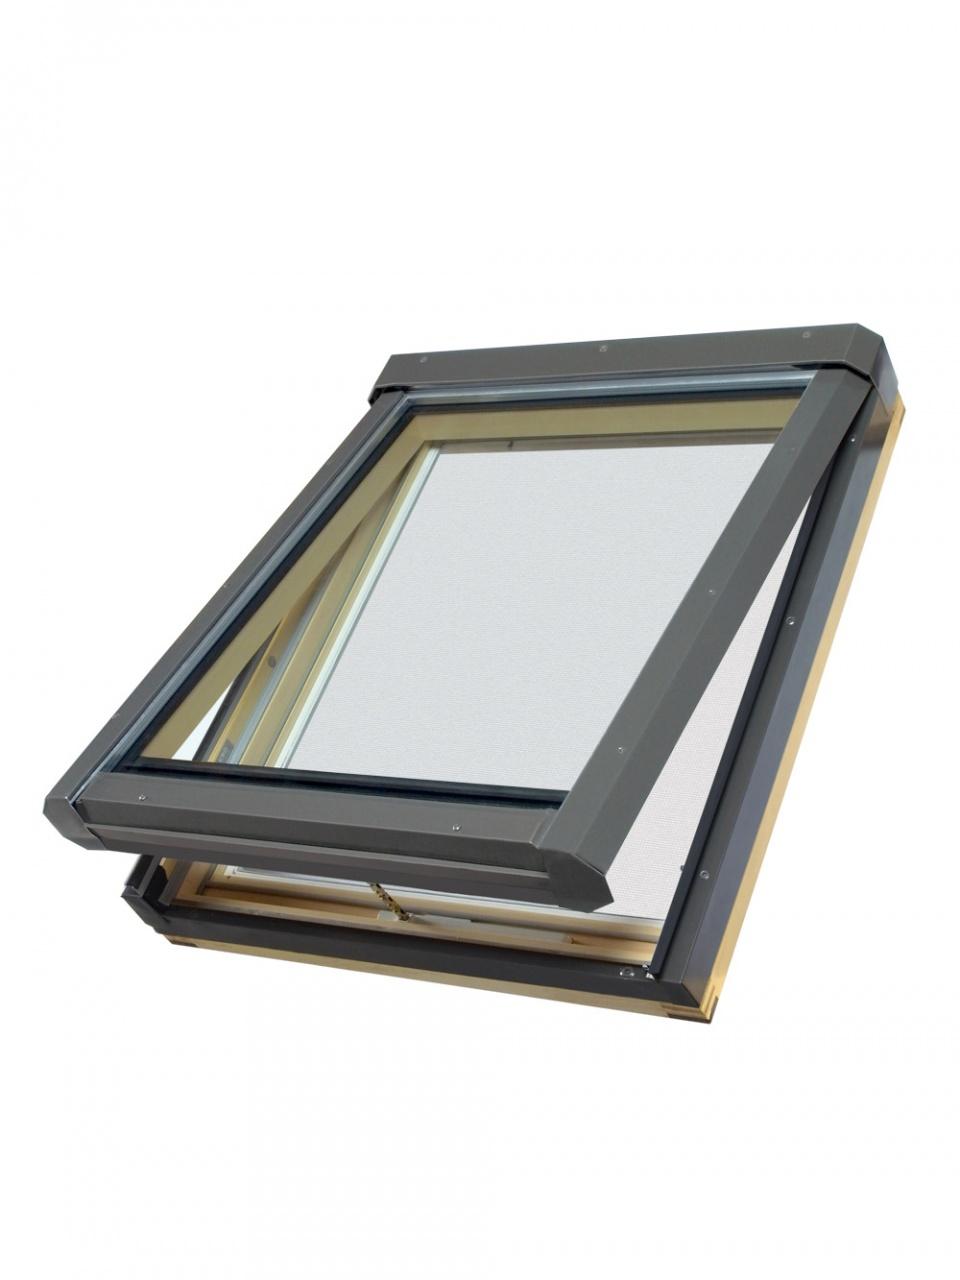 Deck mounted manual venting skylight FV - FAKRO